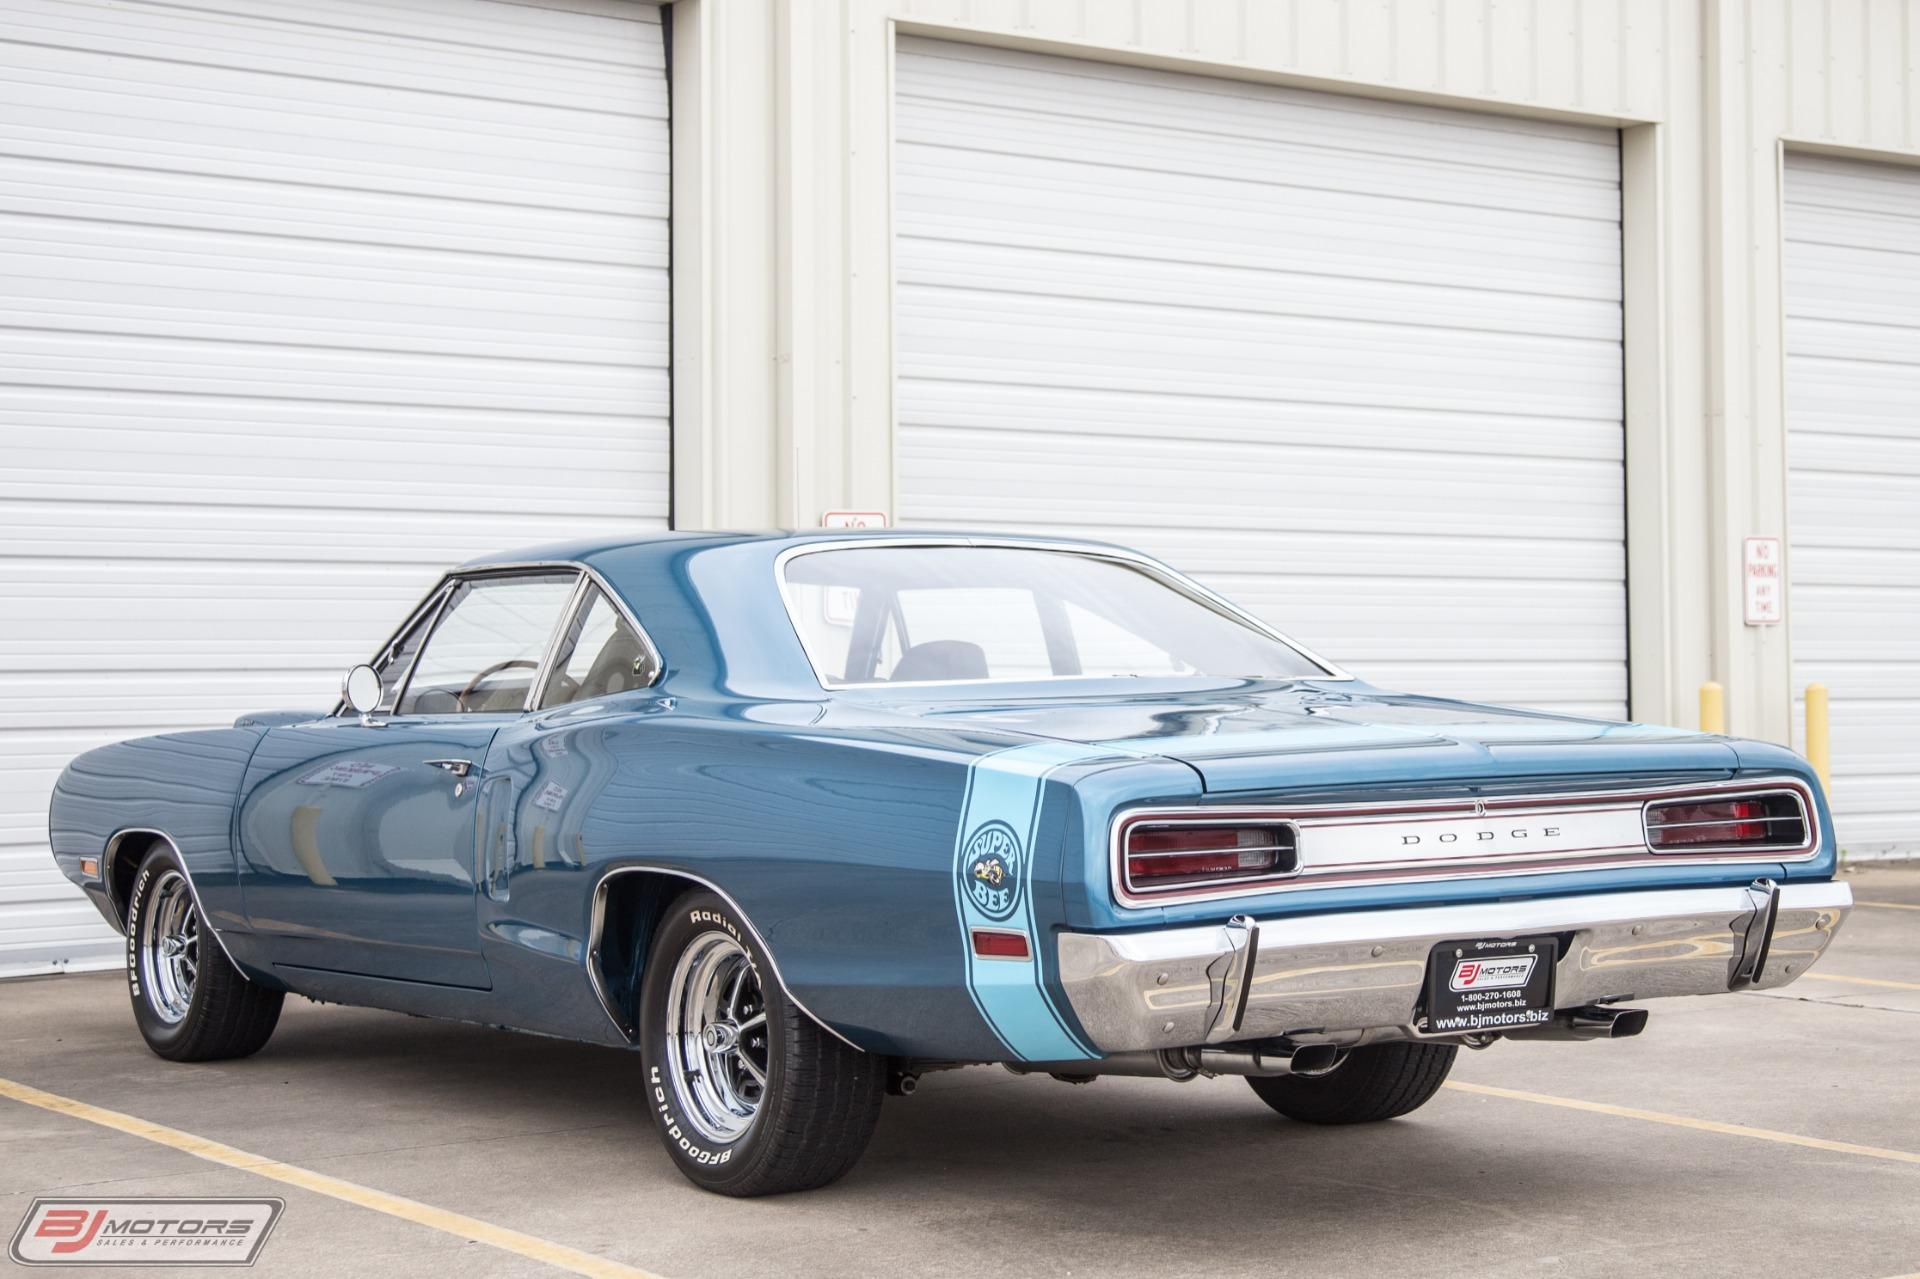 Used-1970-Dodge-Coronet-Superbee